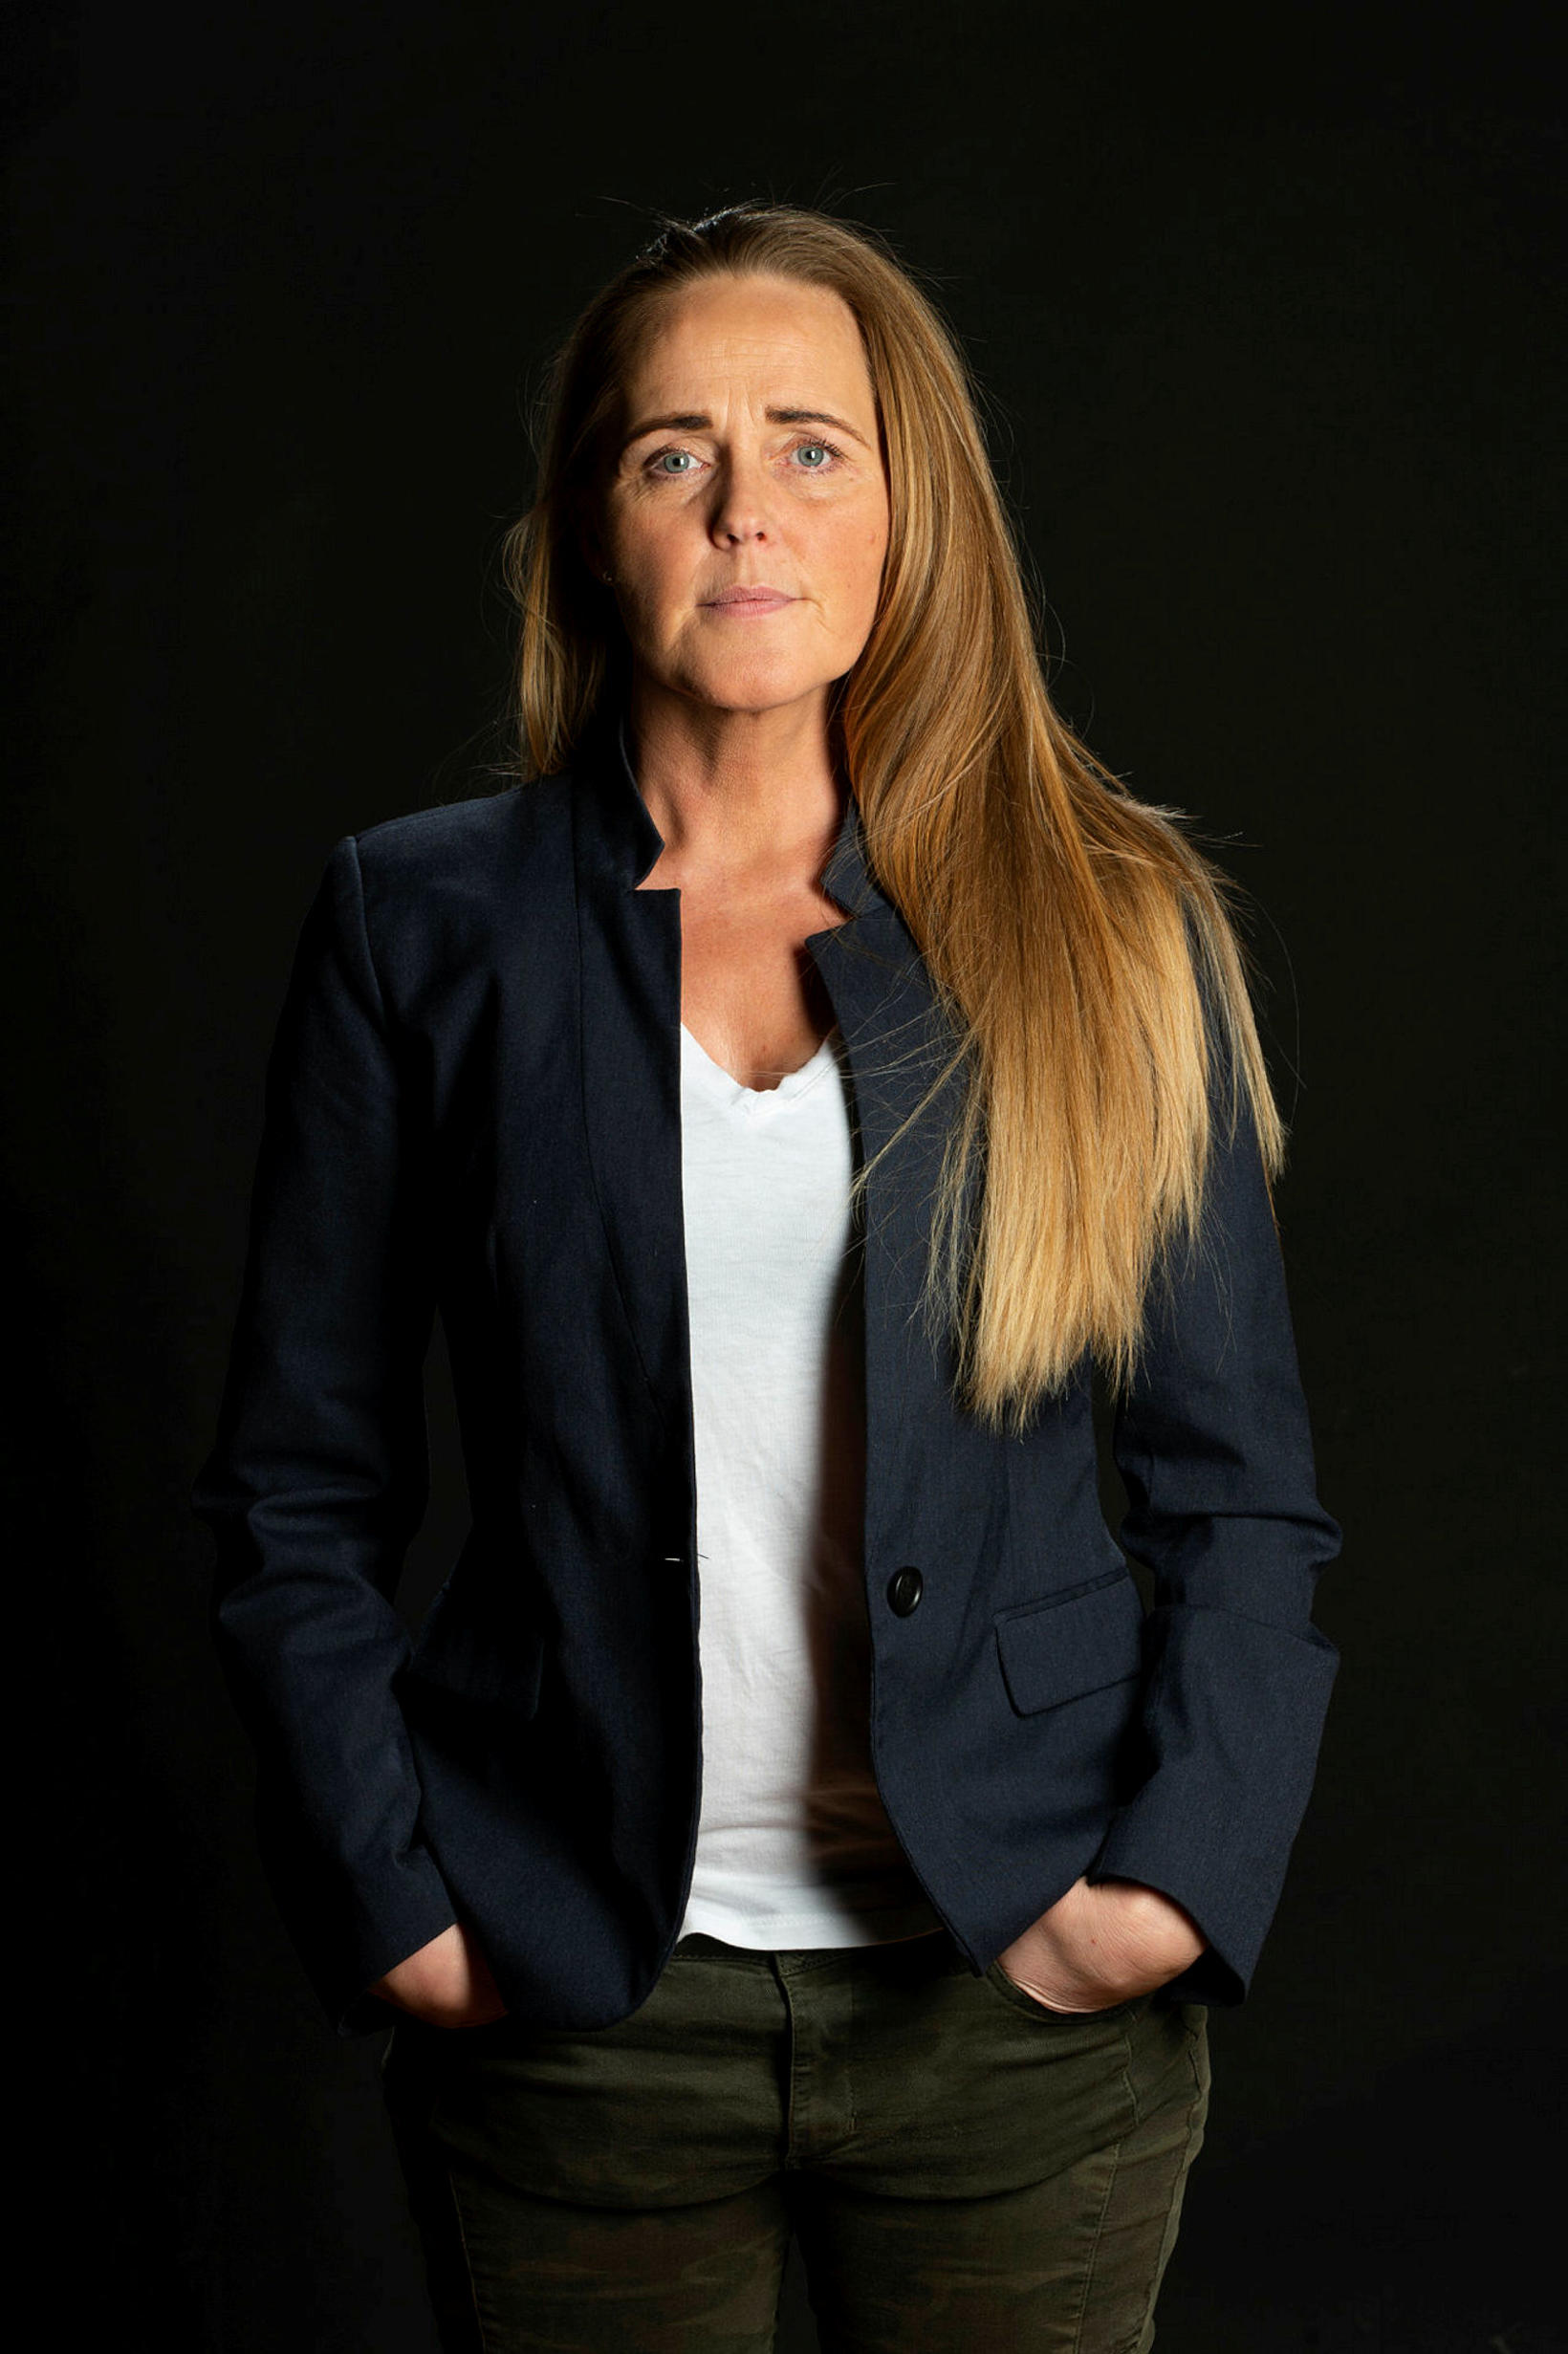 Alma Hafsteinsdóttir